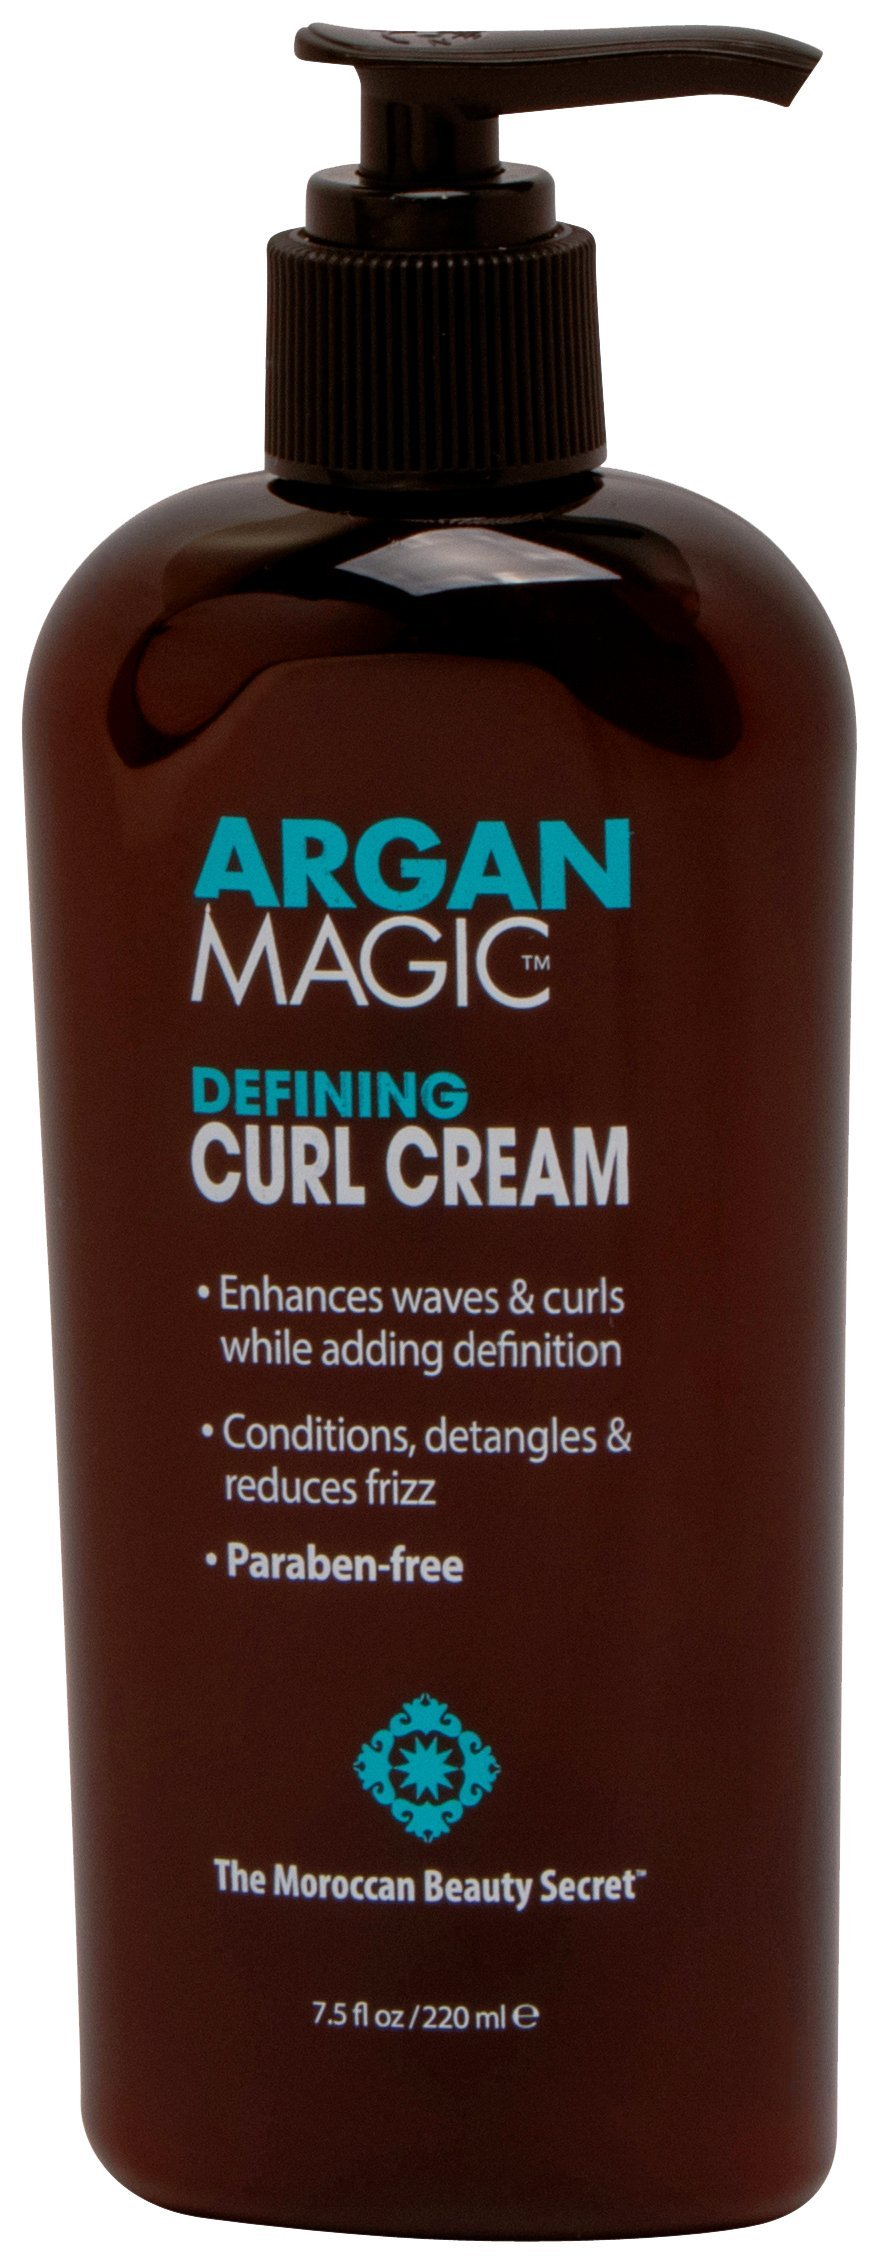 Argan Magic - ARGAN MAGIC - Defining Curl Cream (7.5 Ounce/220 Milliliter)